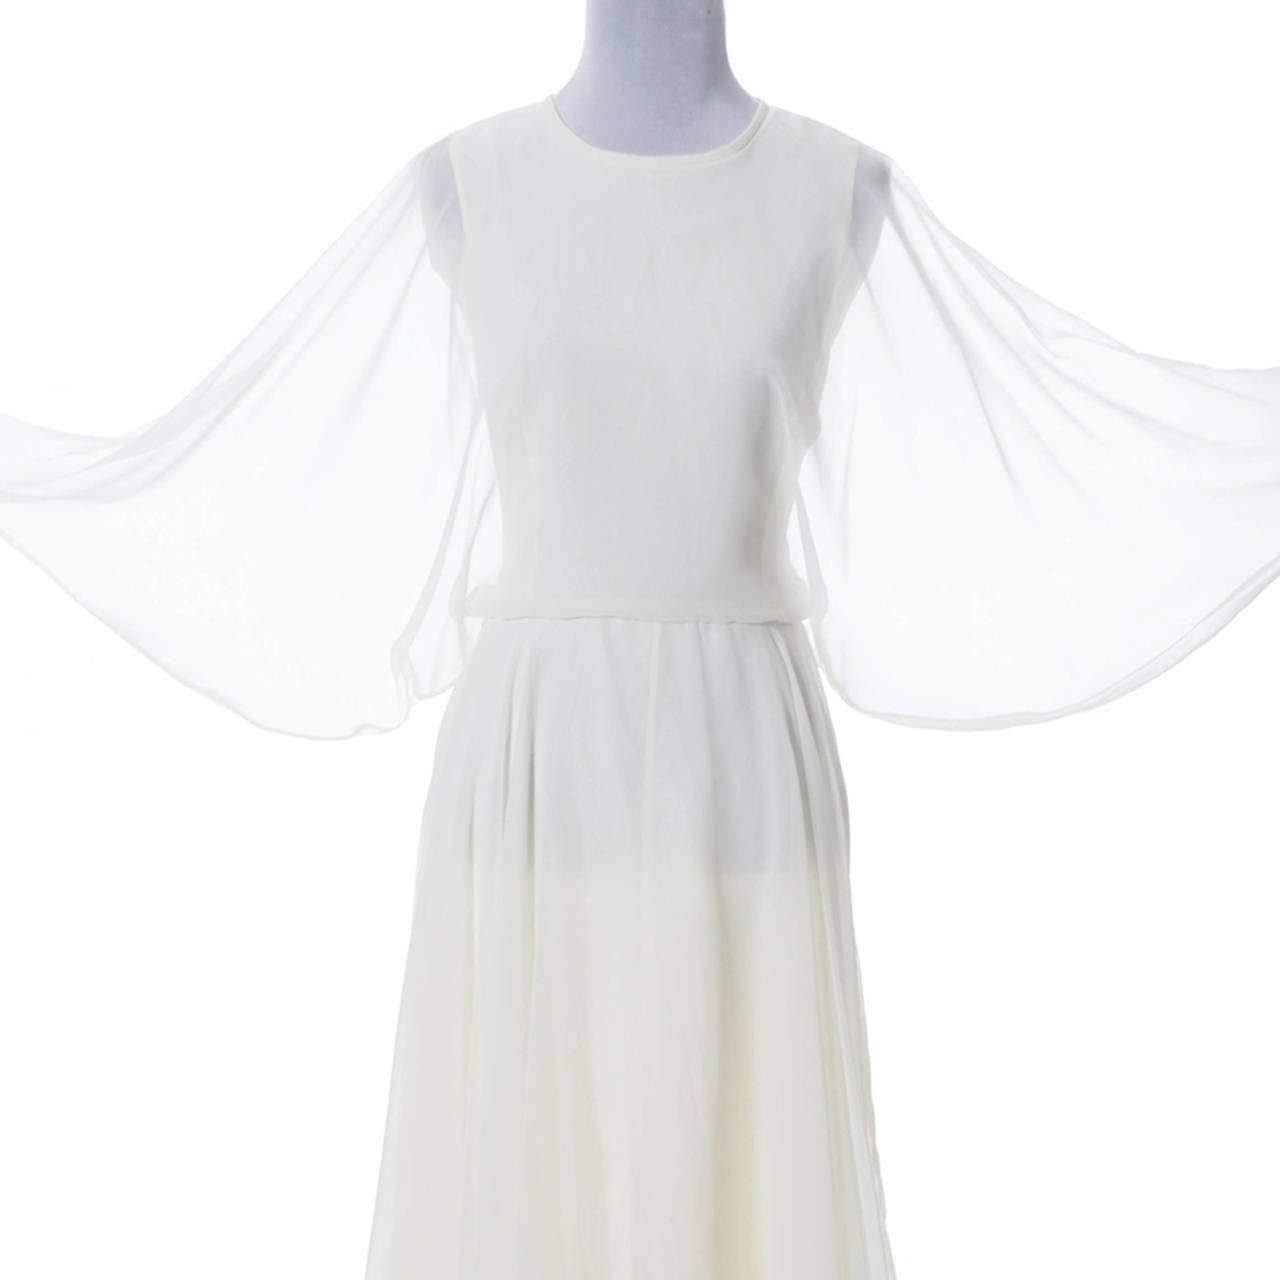 Women's 1970s Vintage Jean Varon John Bates Chiffon Designer Dress Batwing Sleeves For Sale